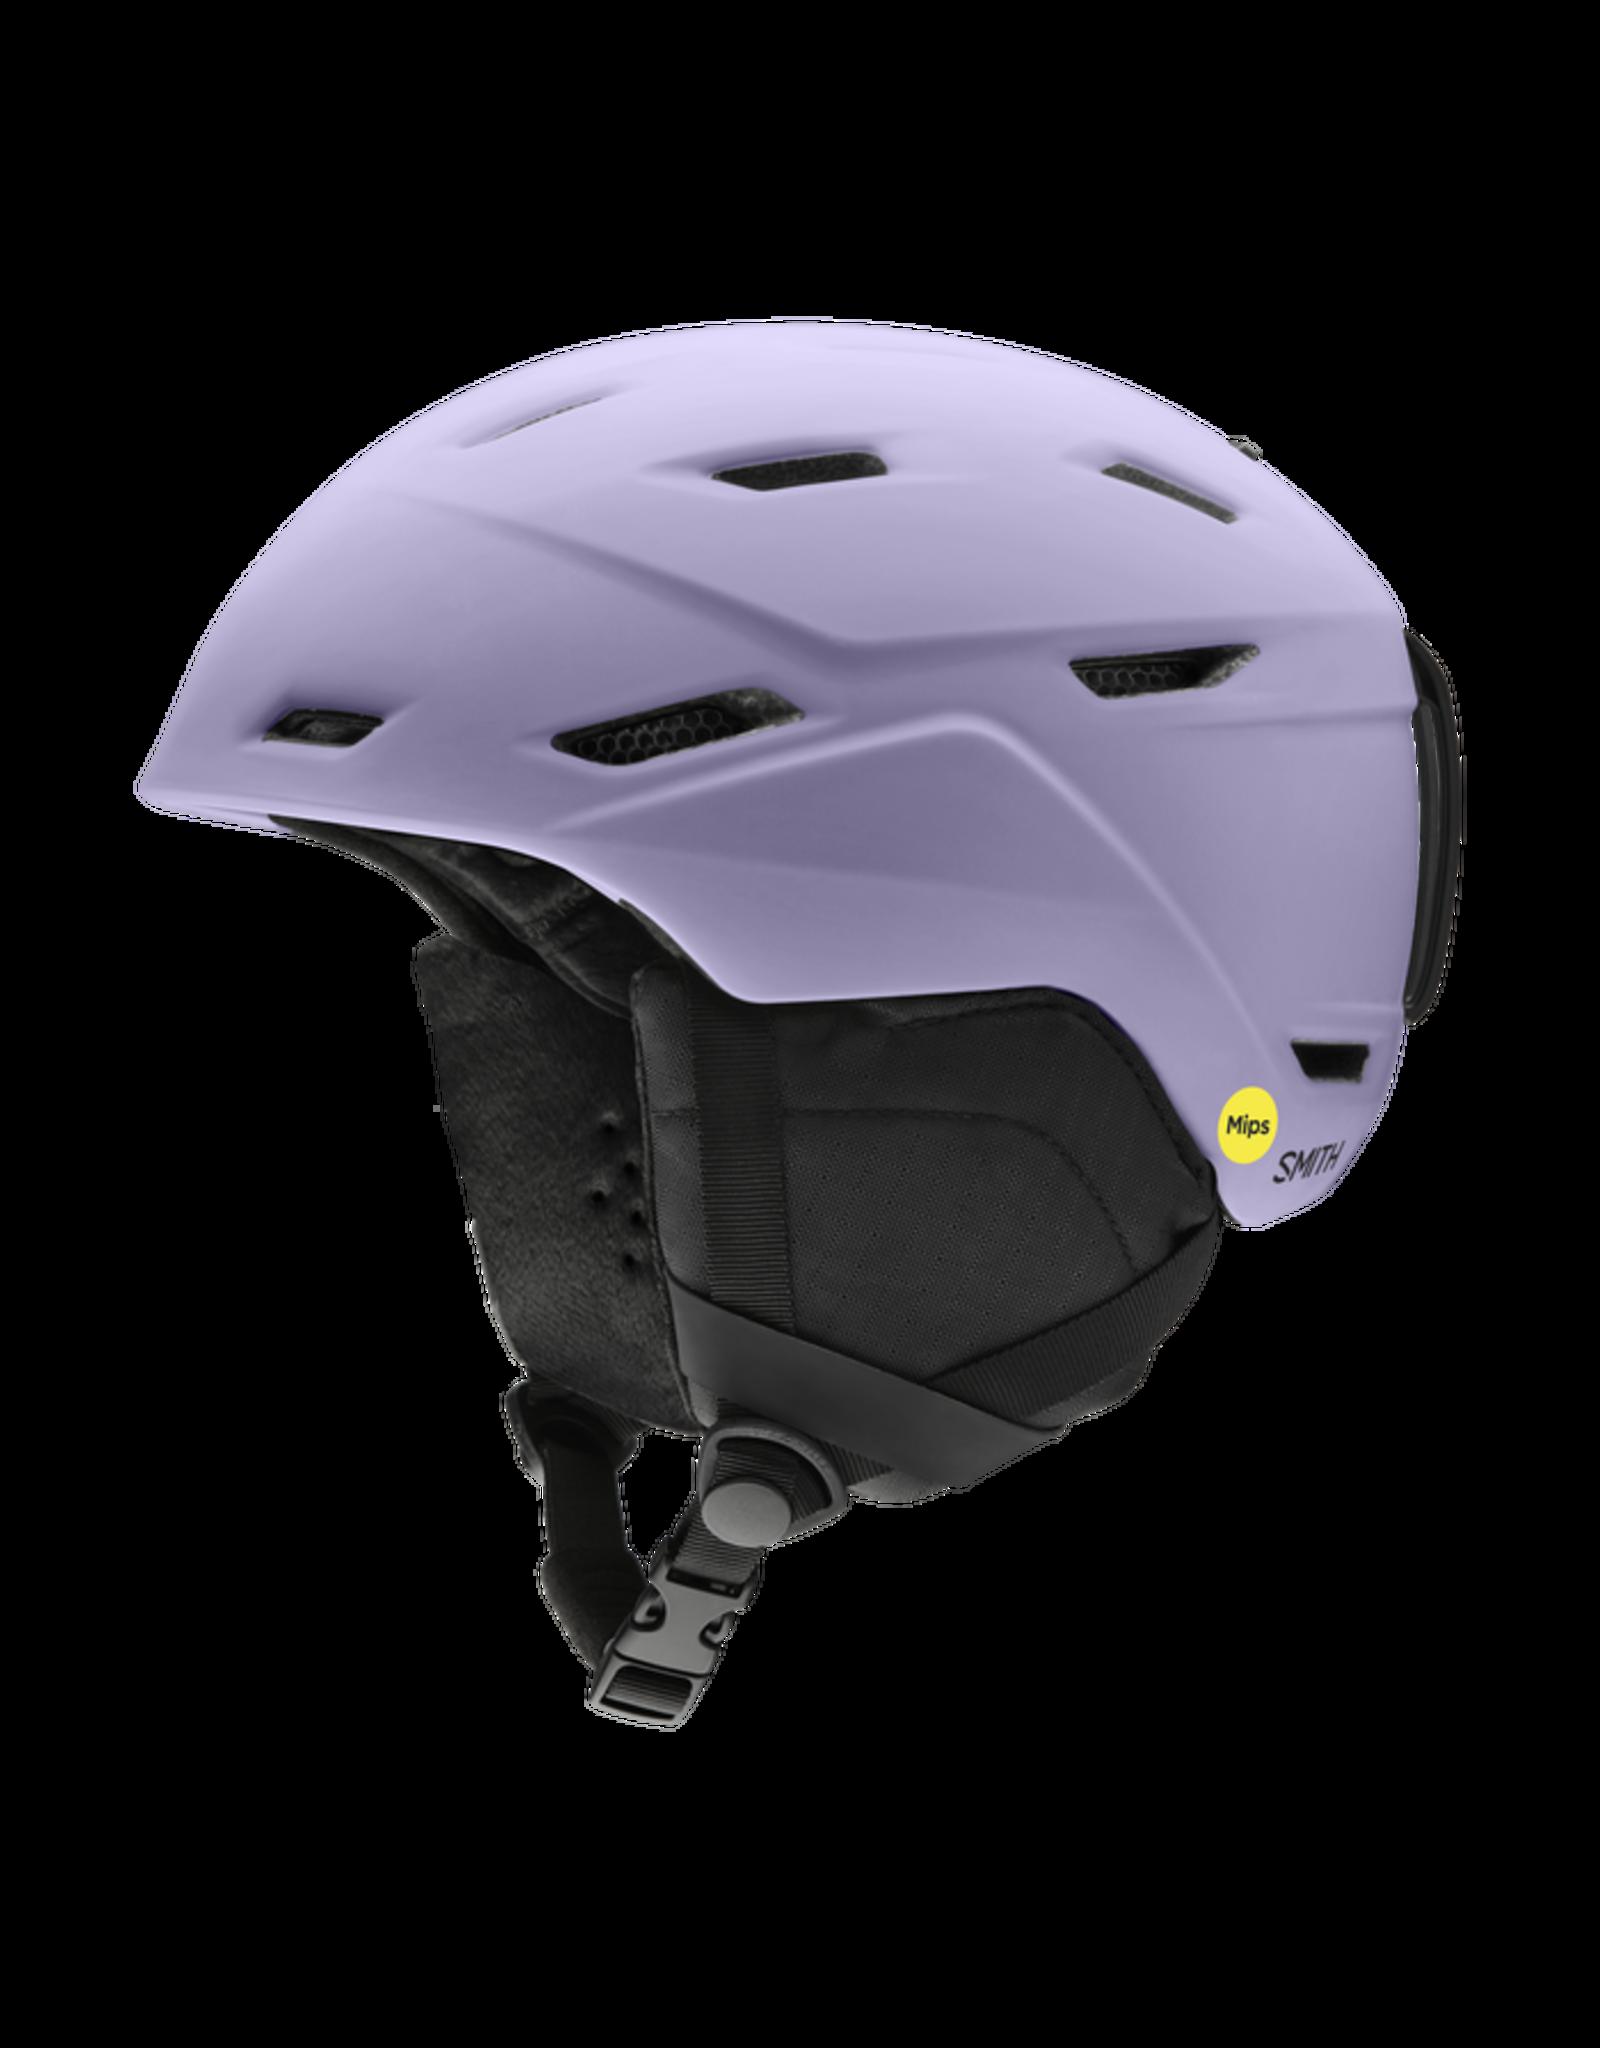 smith optics Smith Mirage mips helmet - Matte Lilac - Small 51-55cm